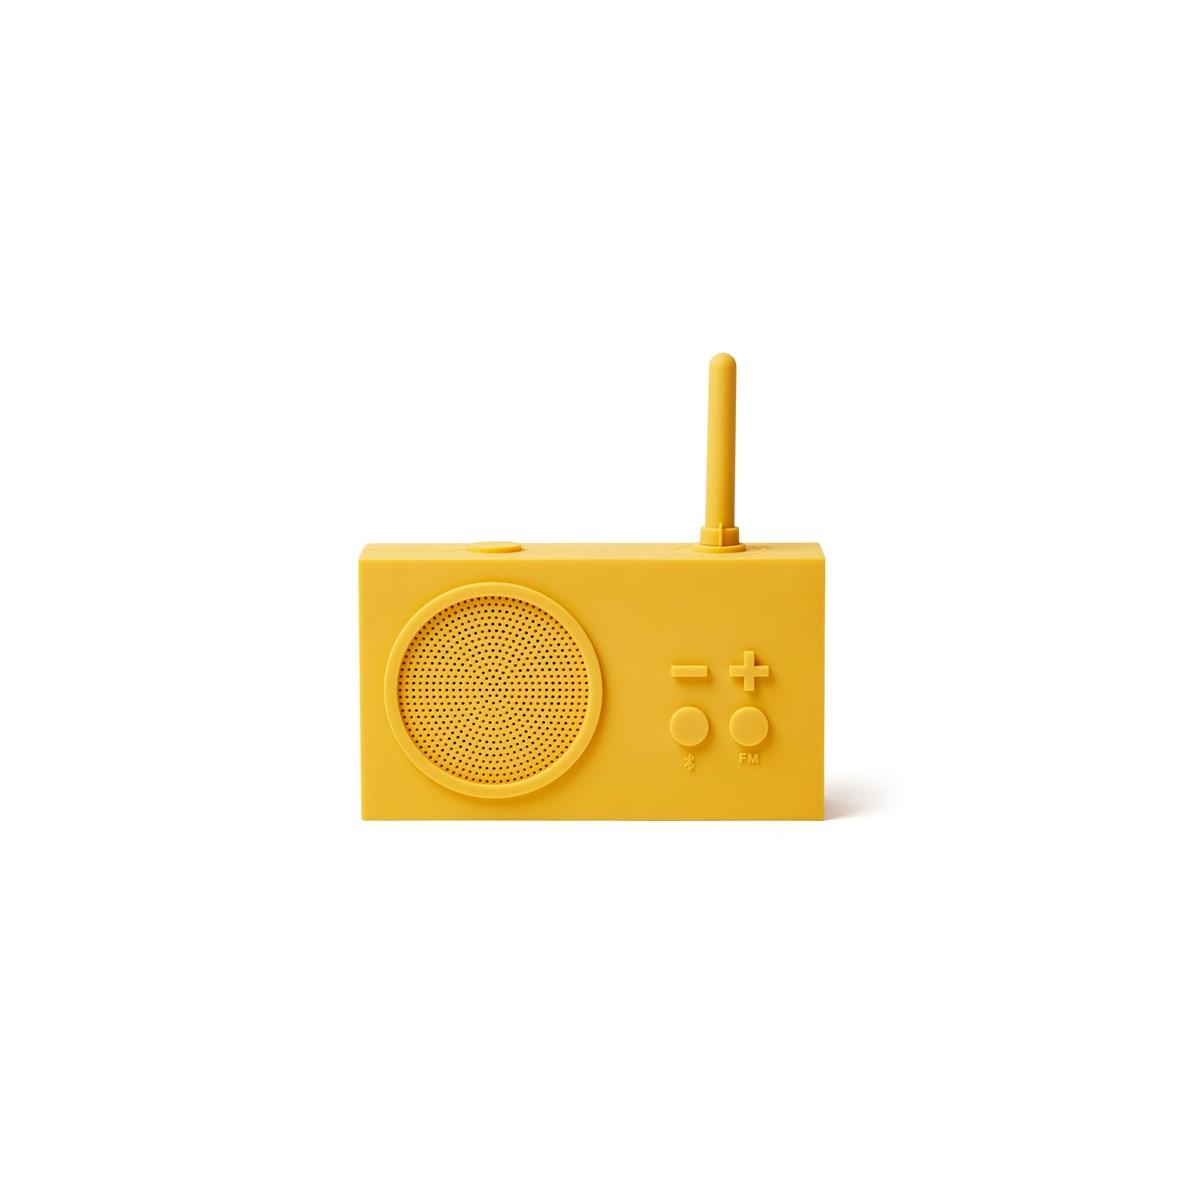 Enceinte Bluetooth et Radio en Gomme Jaune